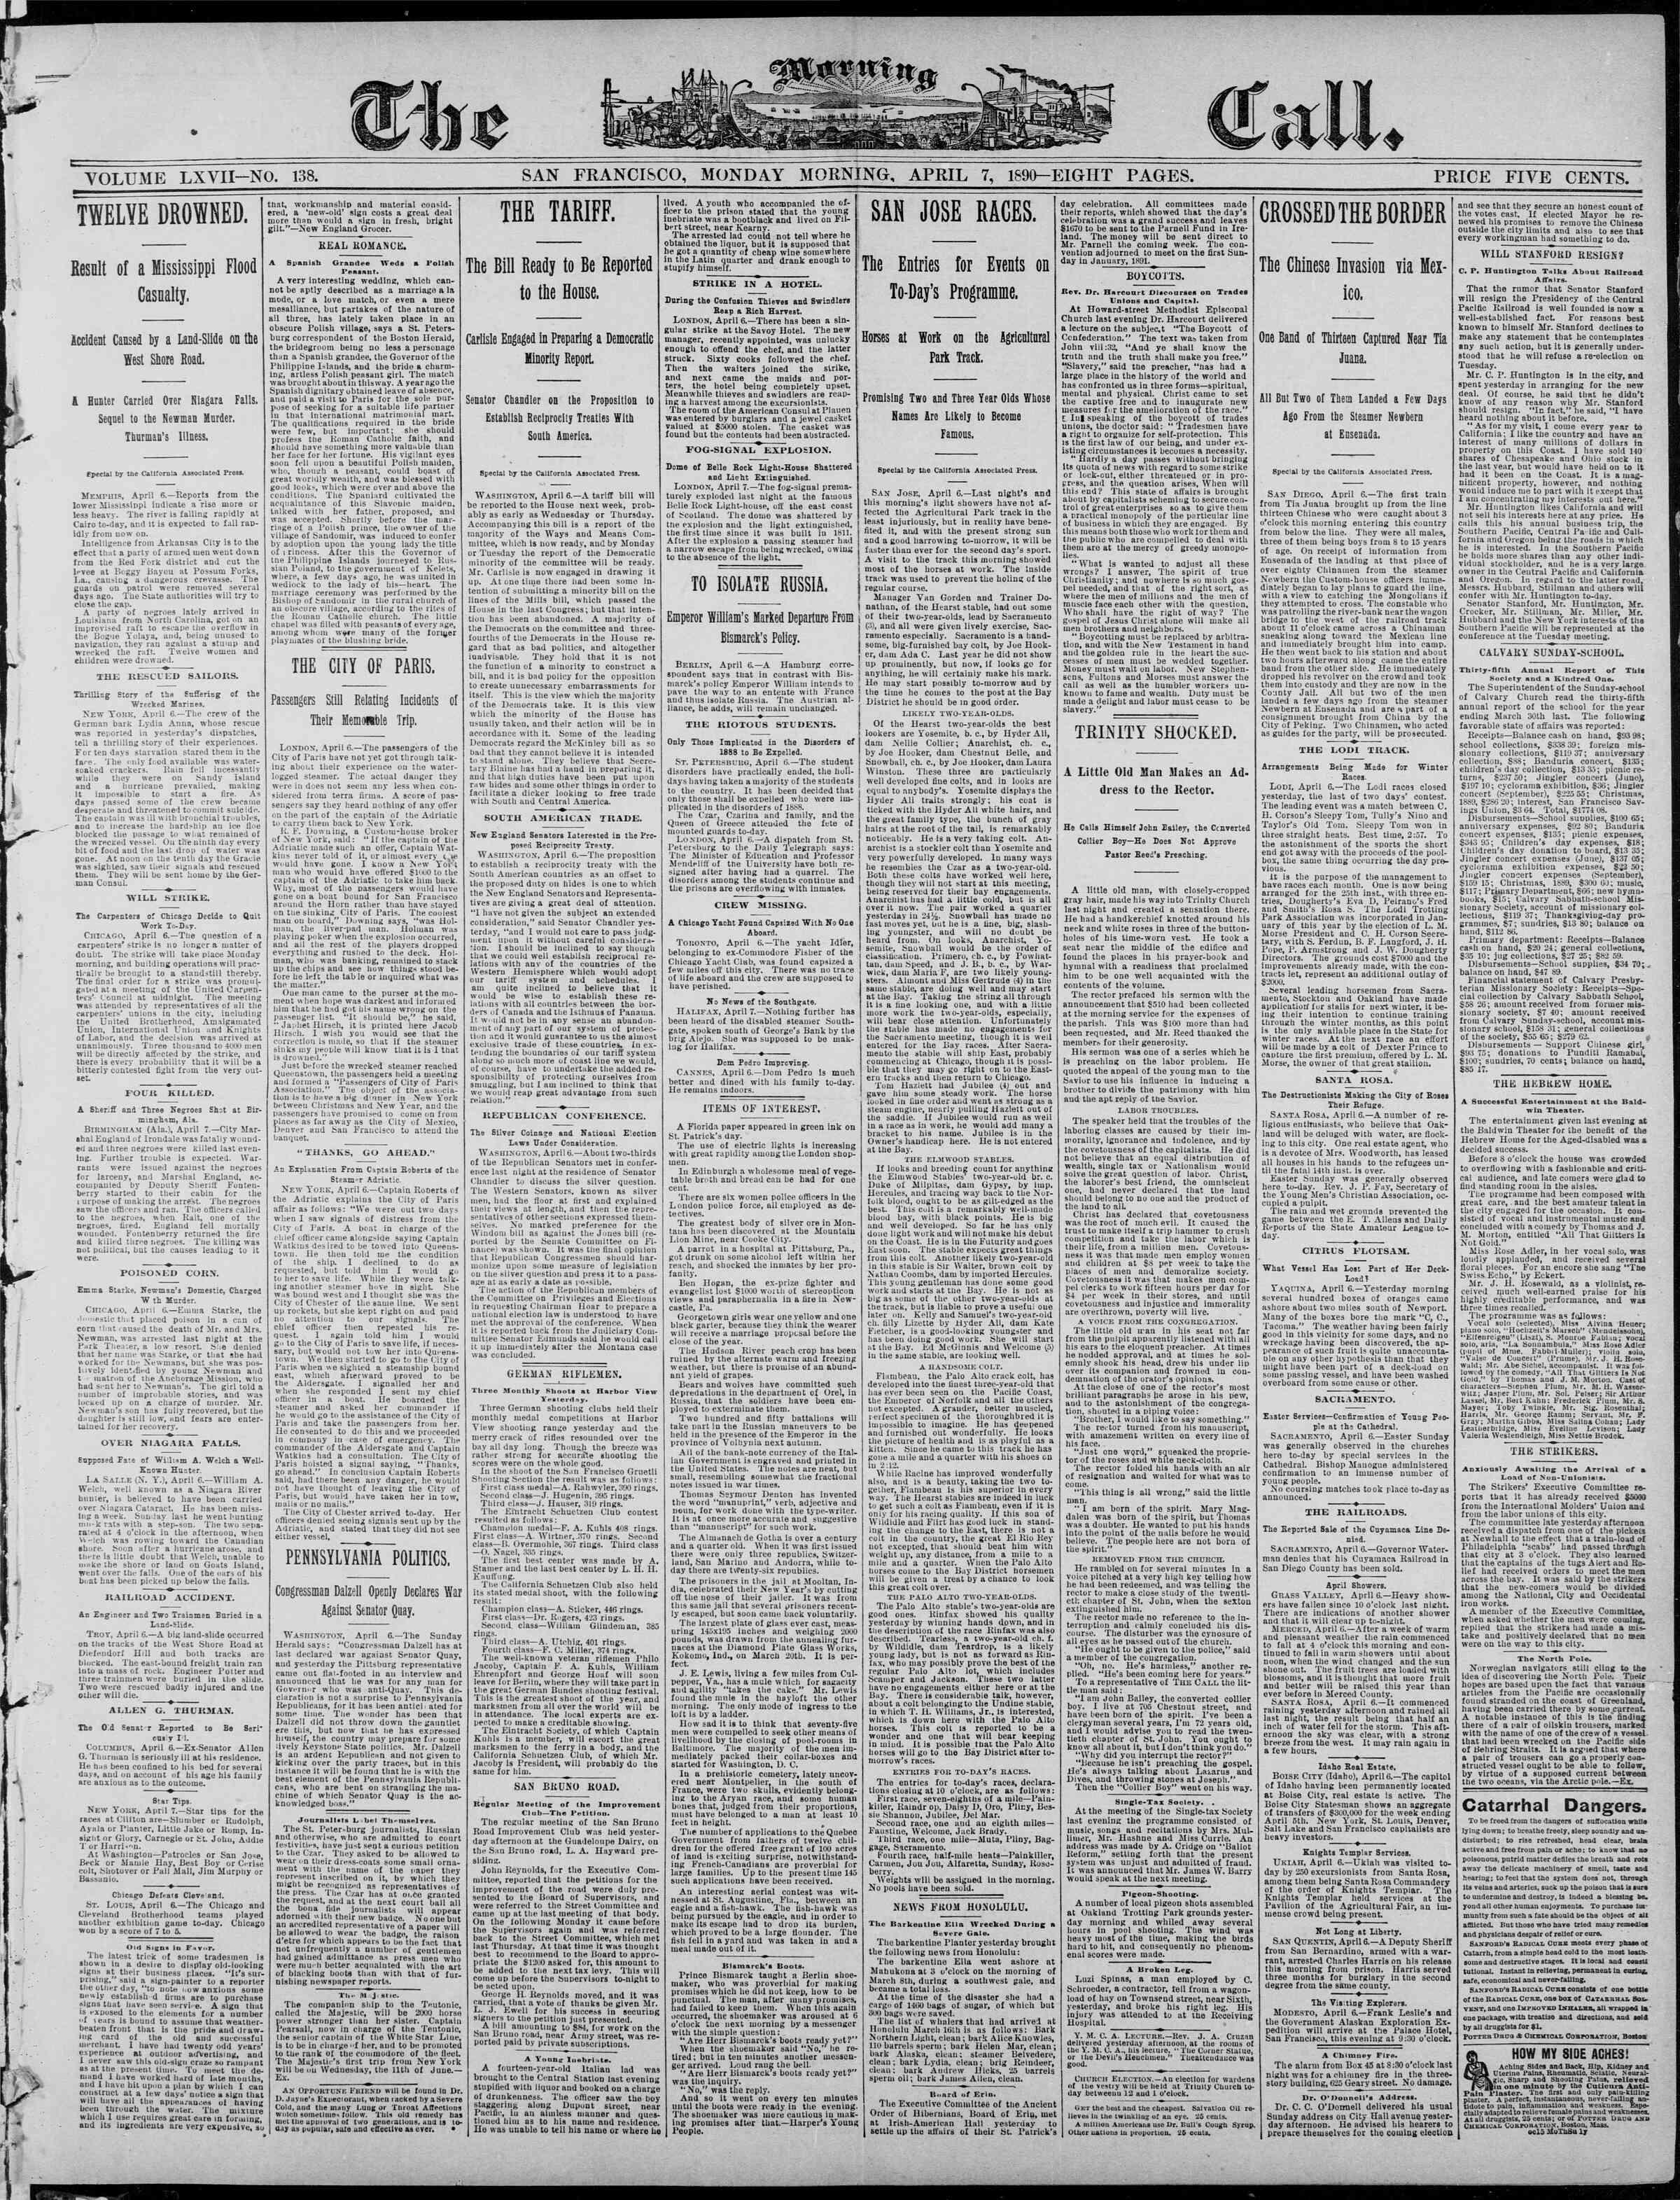 7 Nisan 1890 Tarihli The Morning Call (San Francisco) Dergisi Sayfa 1